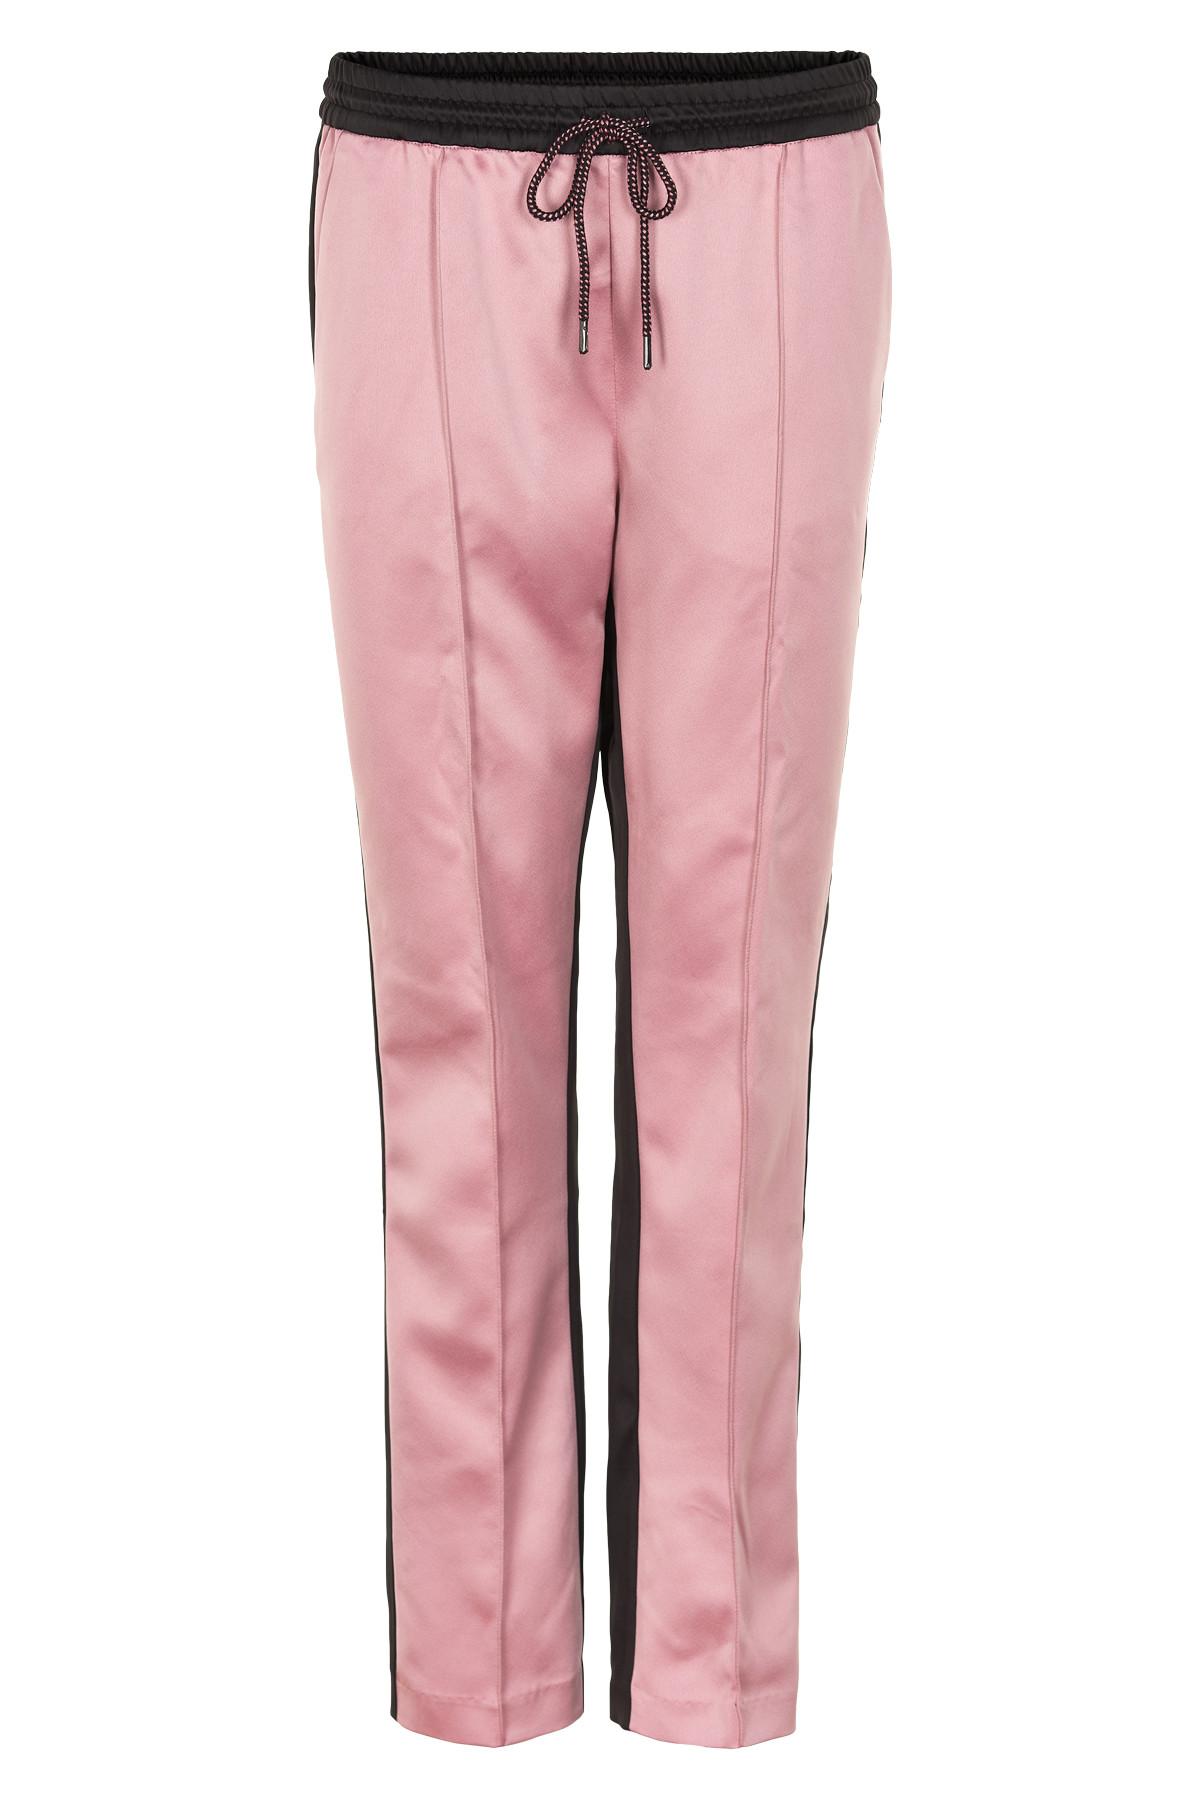 Image of   MUNTHE NORMA BUKSER (Pink, 40)